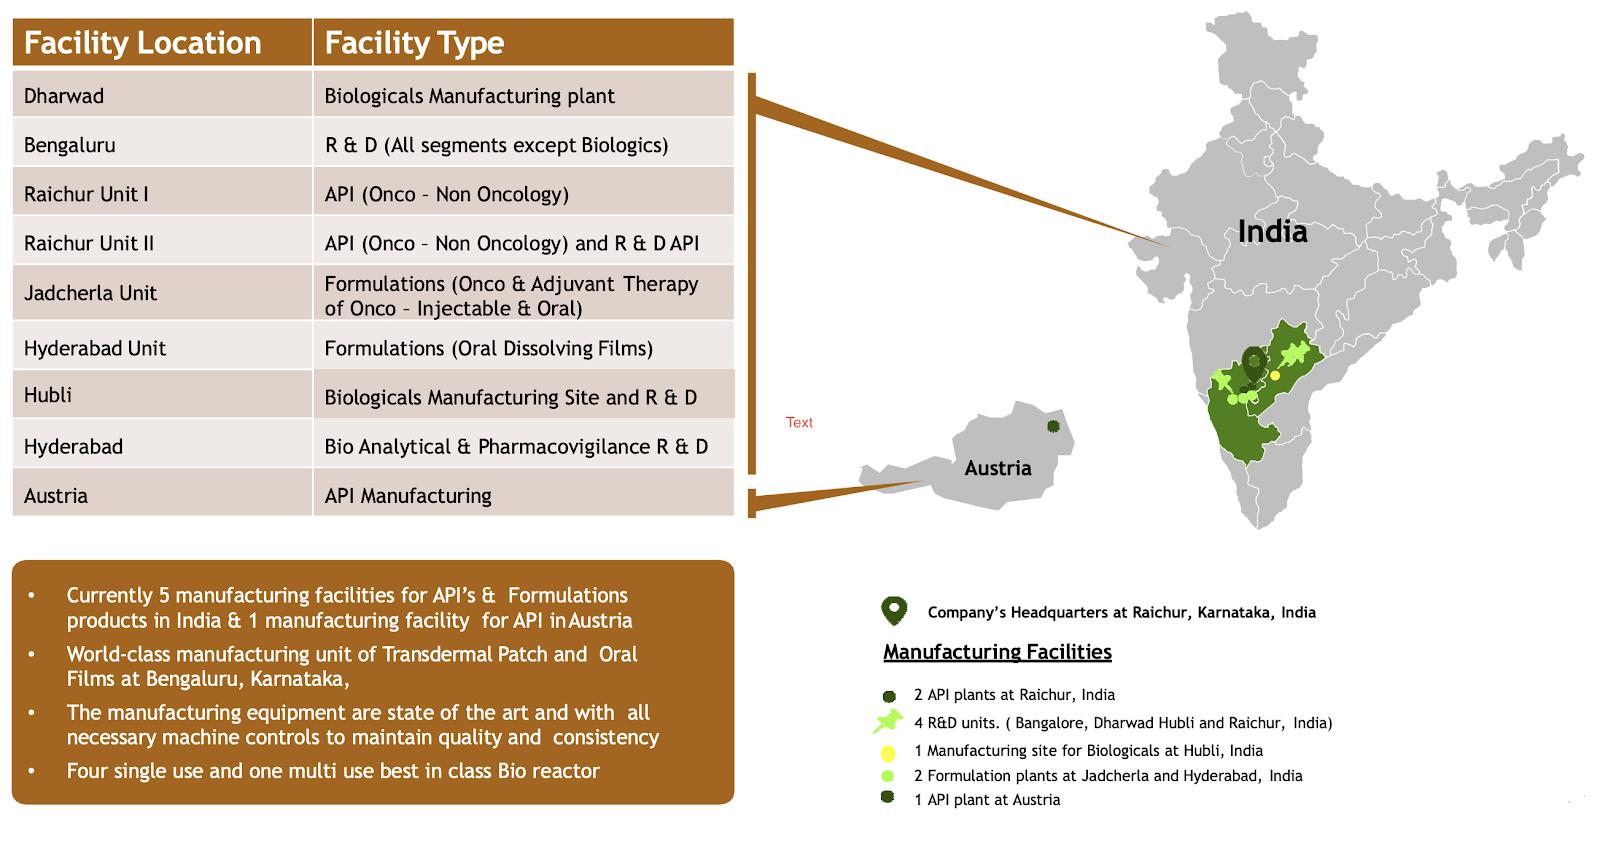 Manufacturing Units of Shilpa Medicare